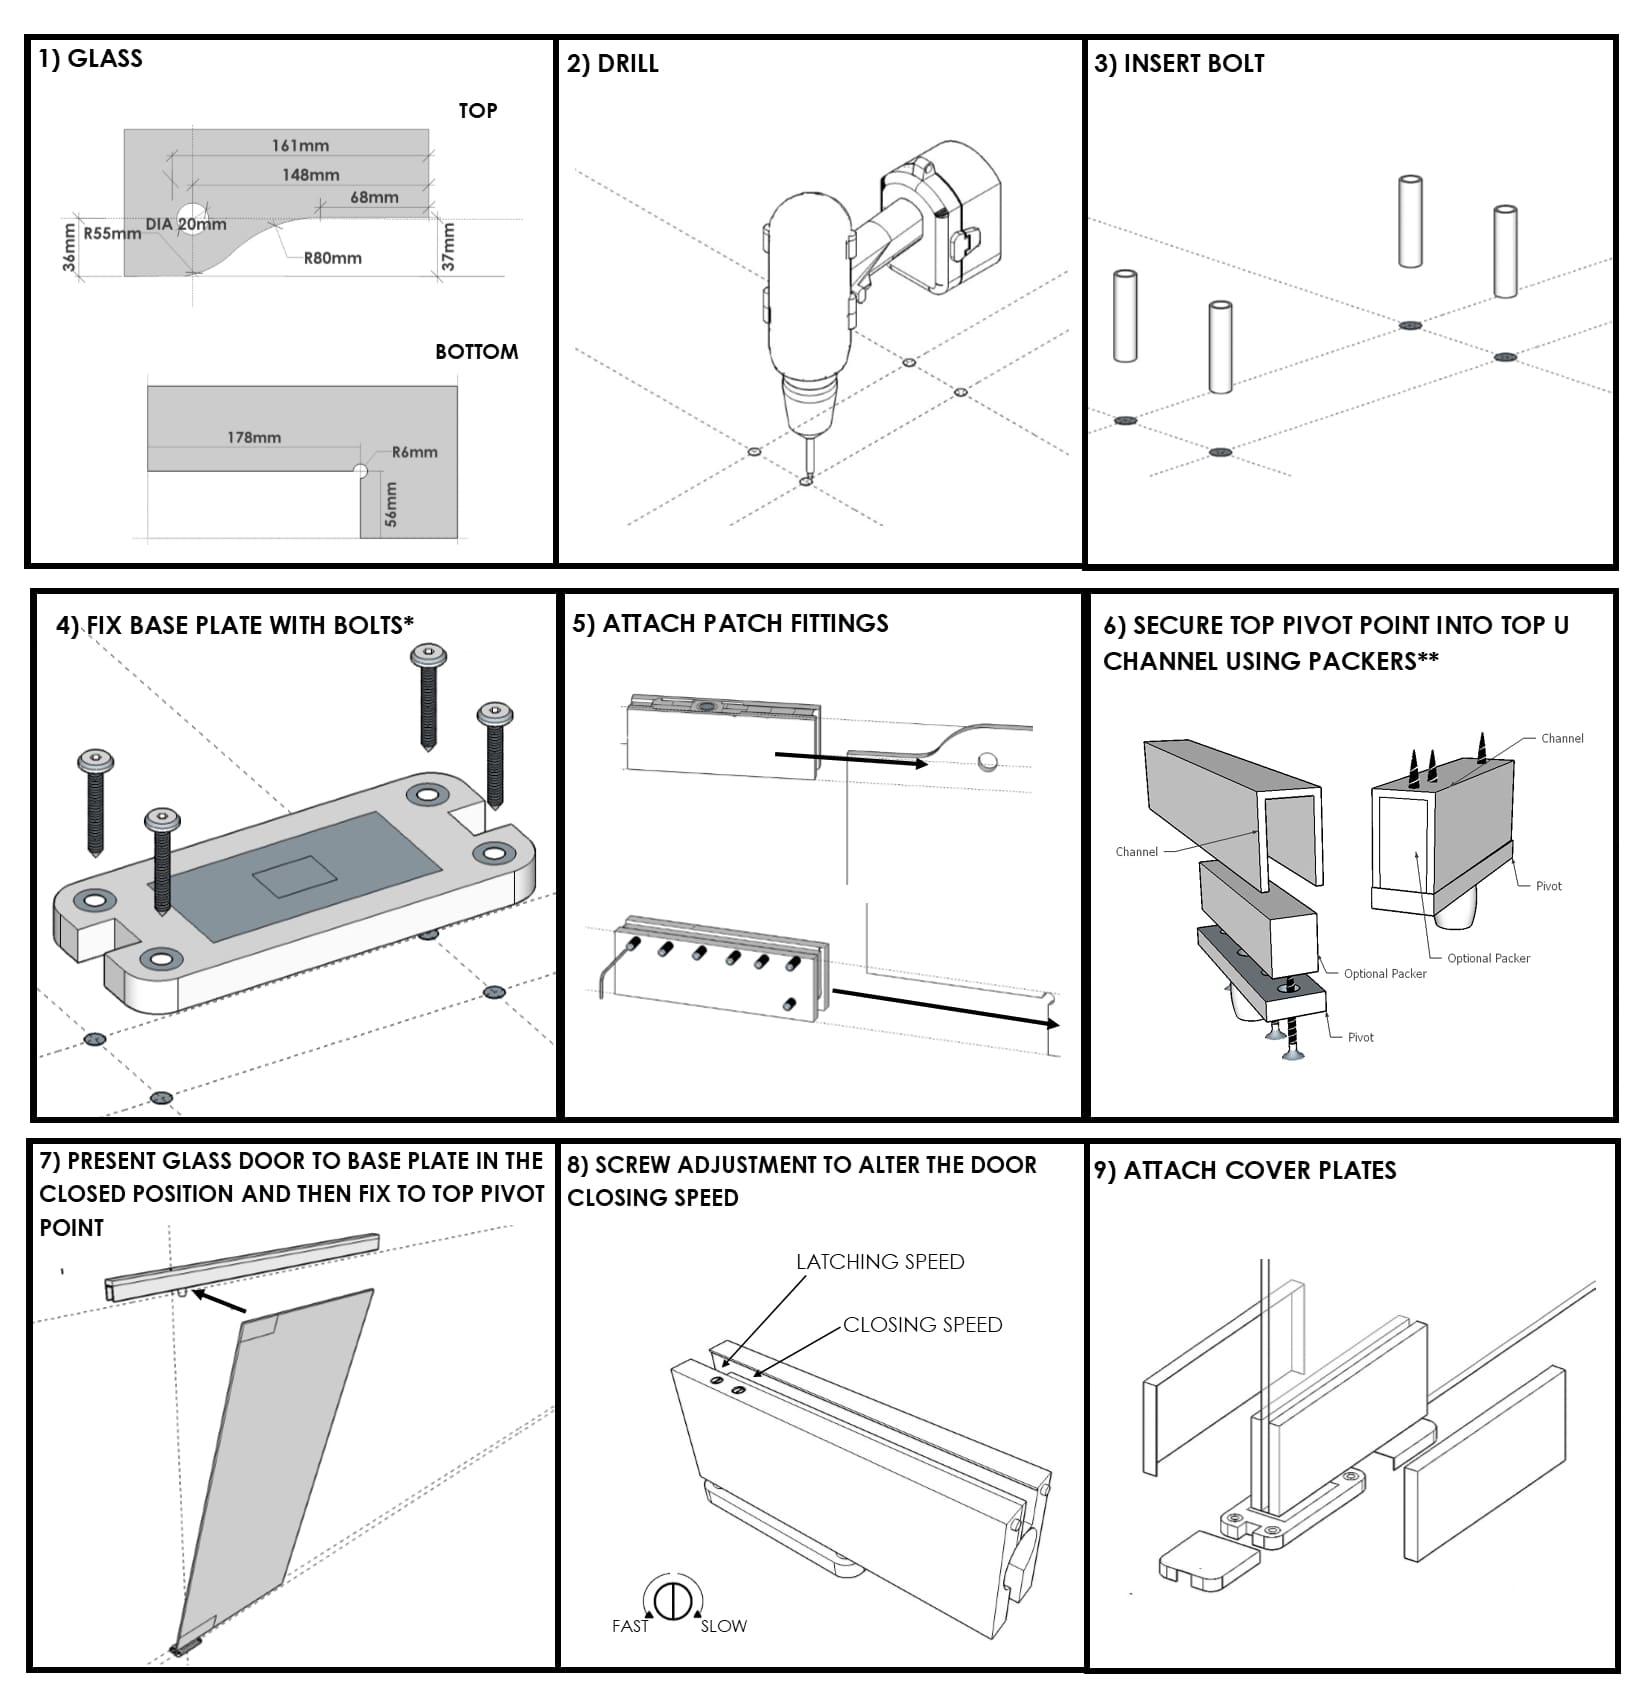 Glass Door Fitting Instructions